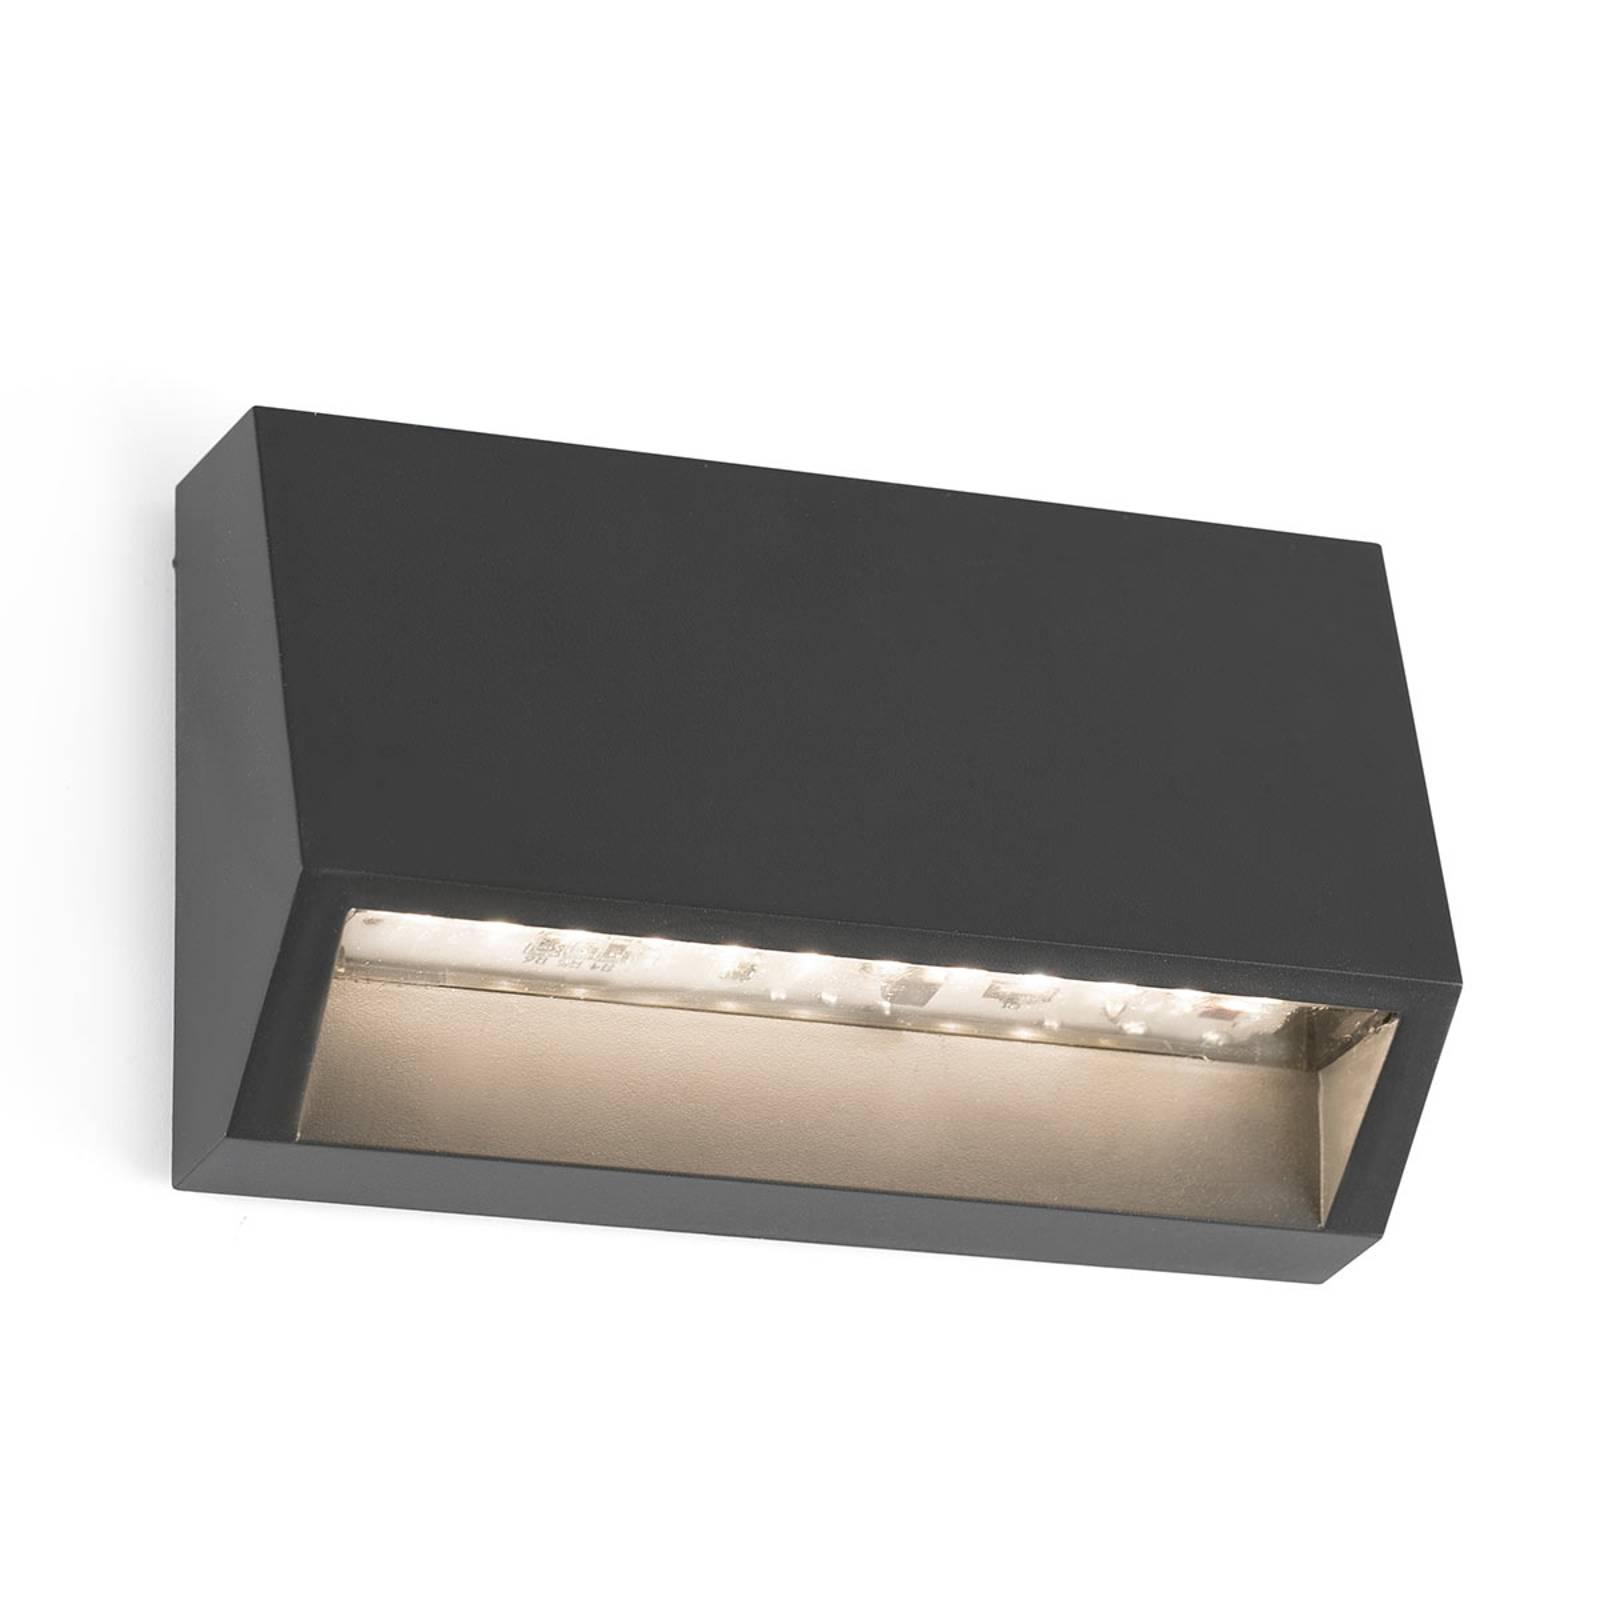 Kulmikas LED-ulkoseinälamppu Must - 9,6 cm